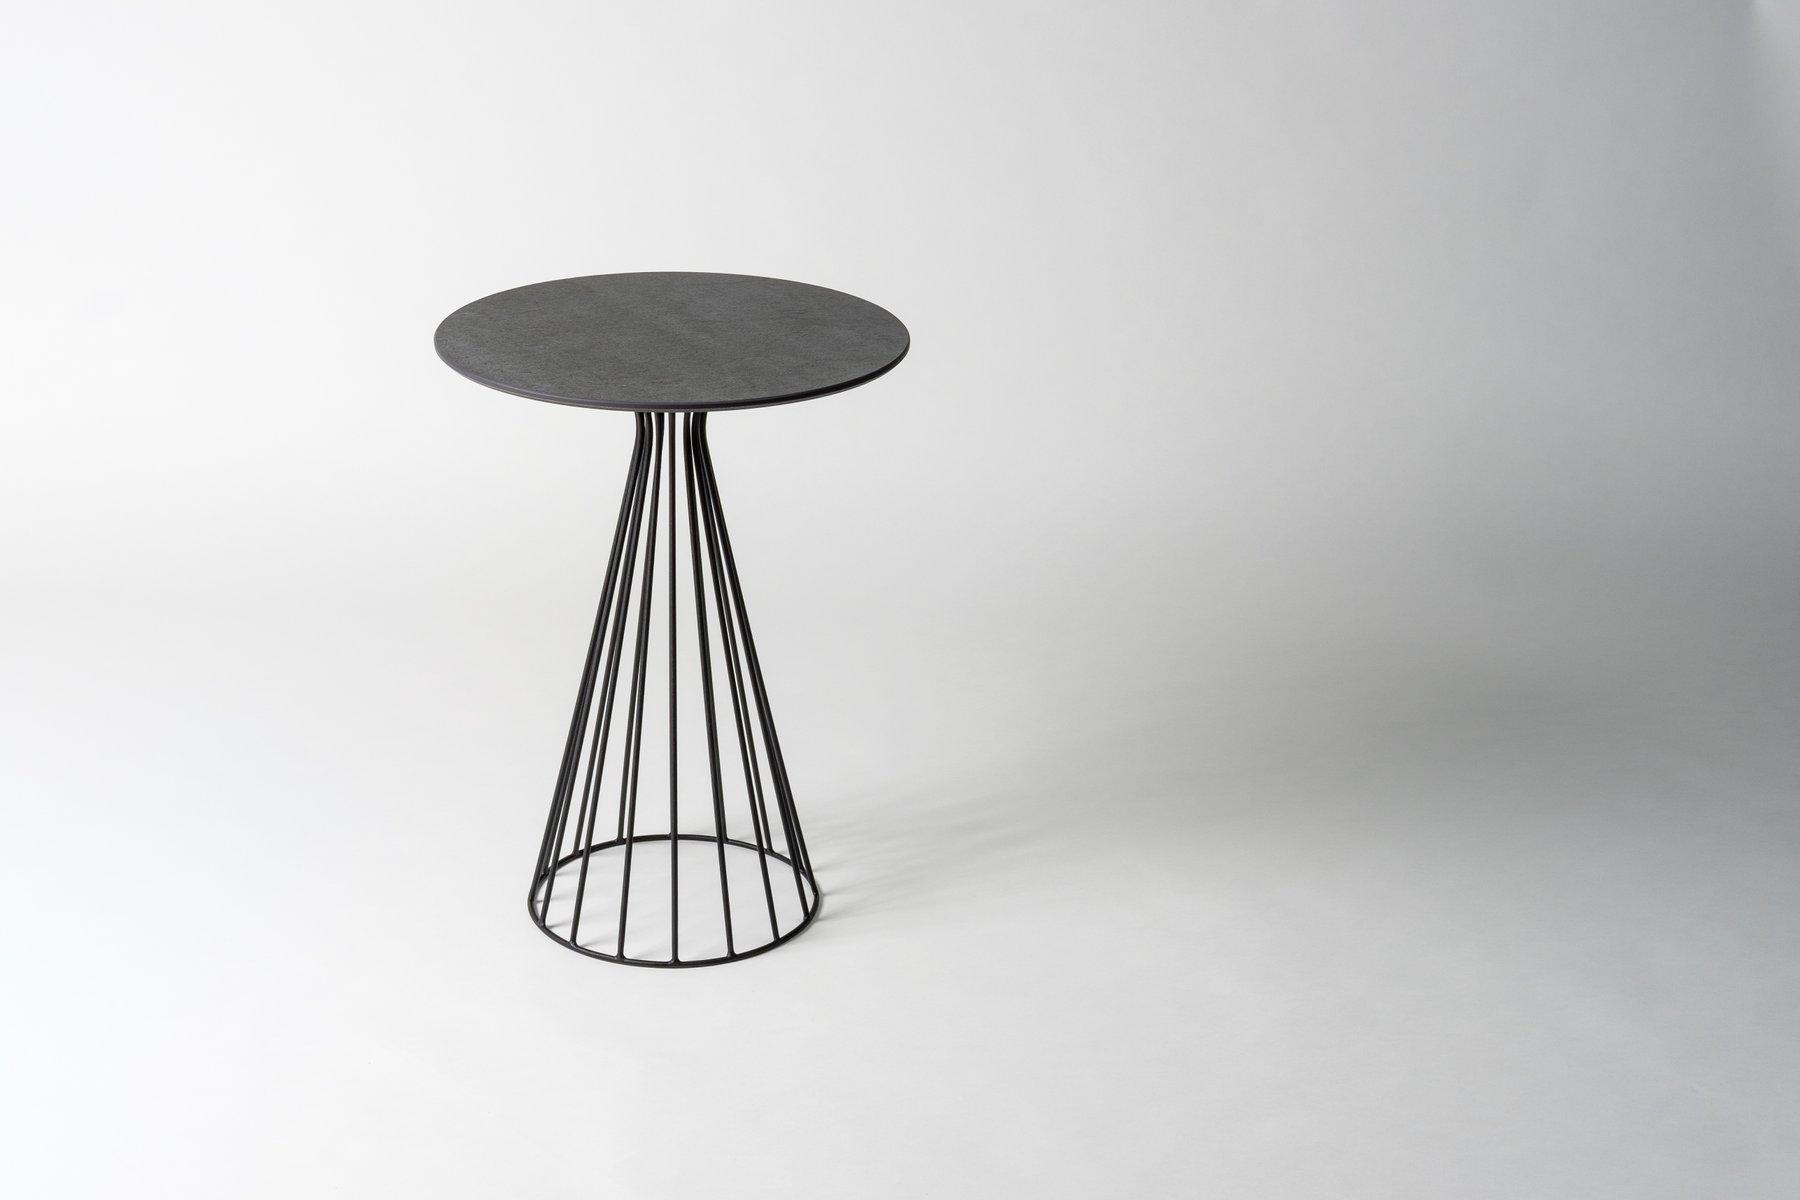 Tavolino da caffè soho in pietra di savoia di alessio elli per